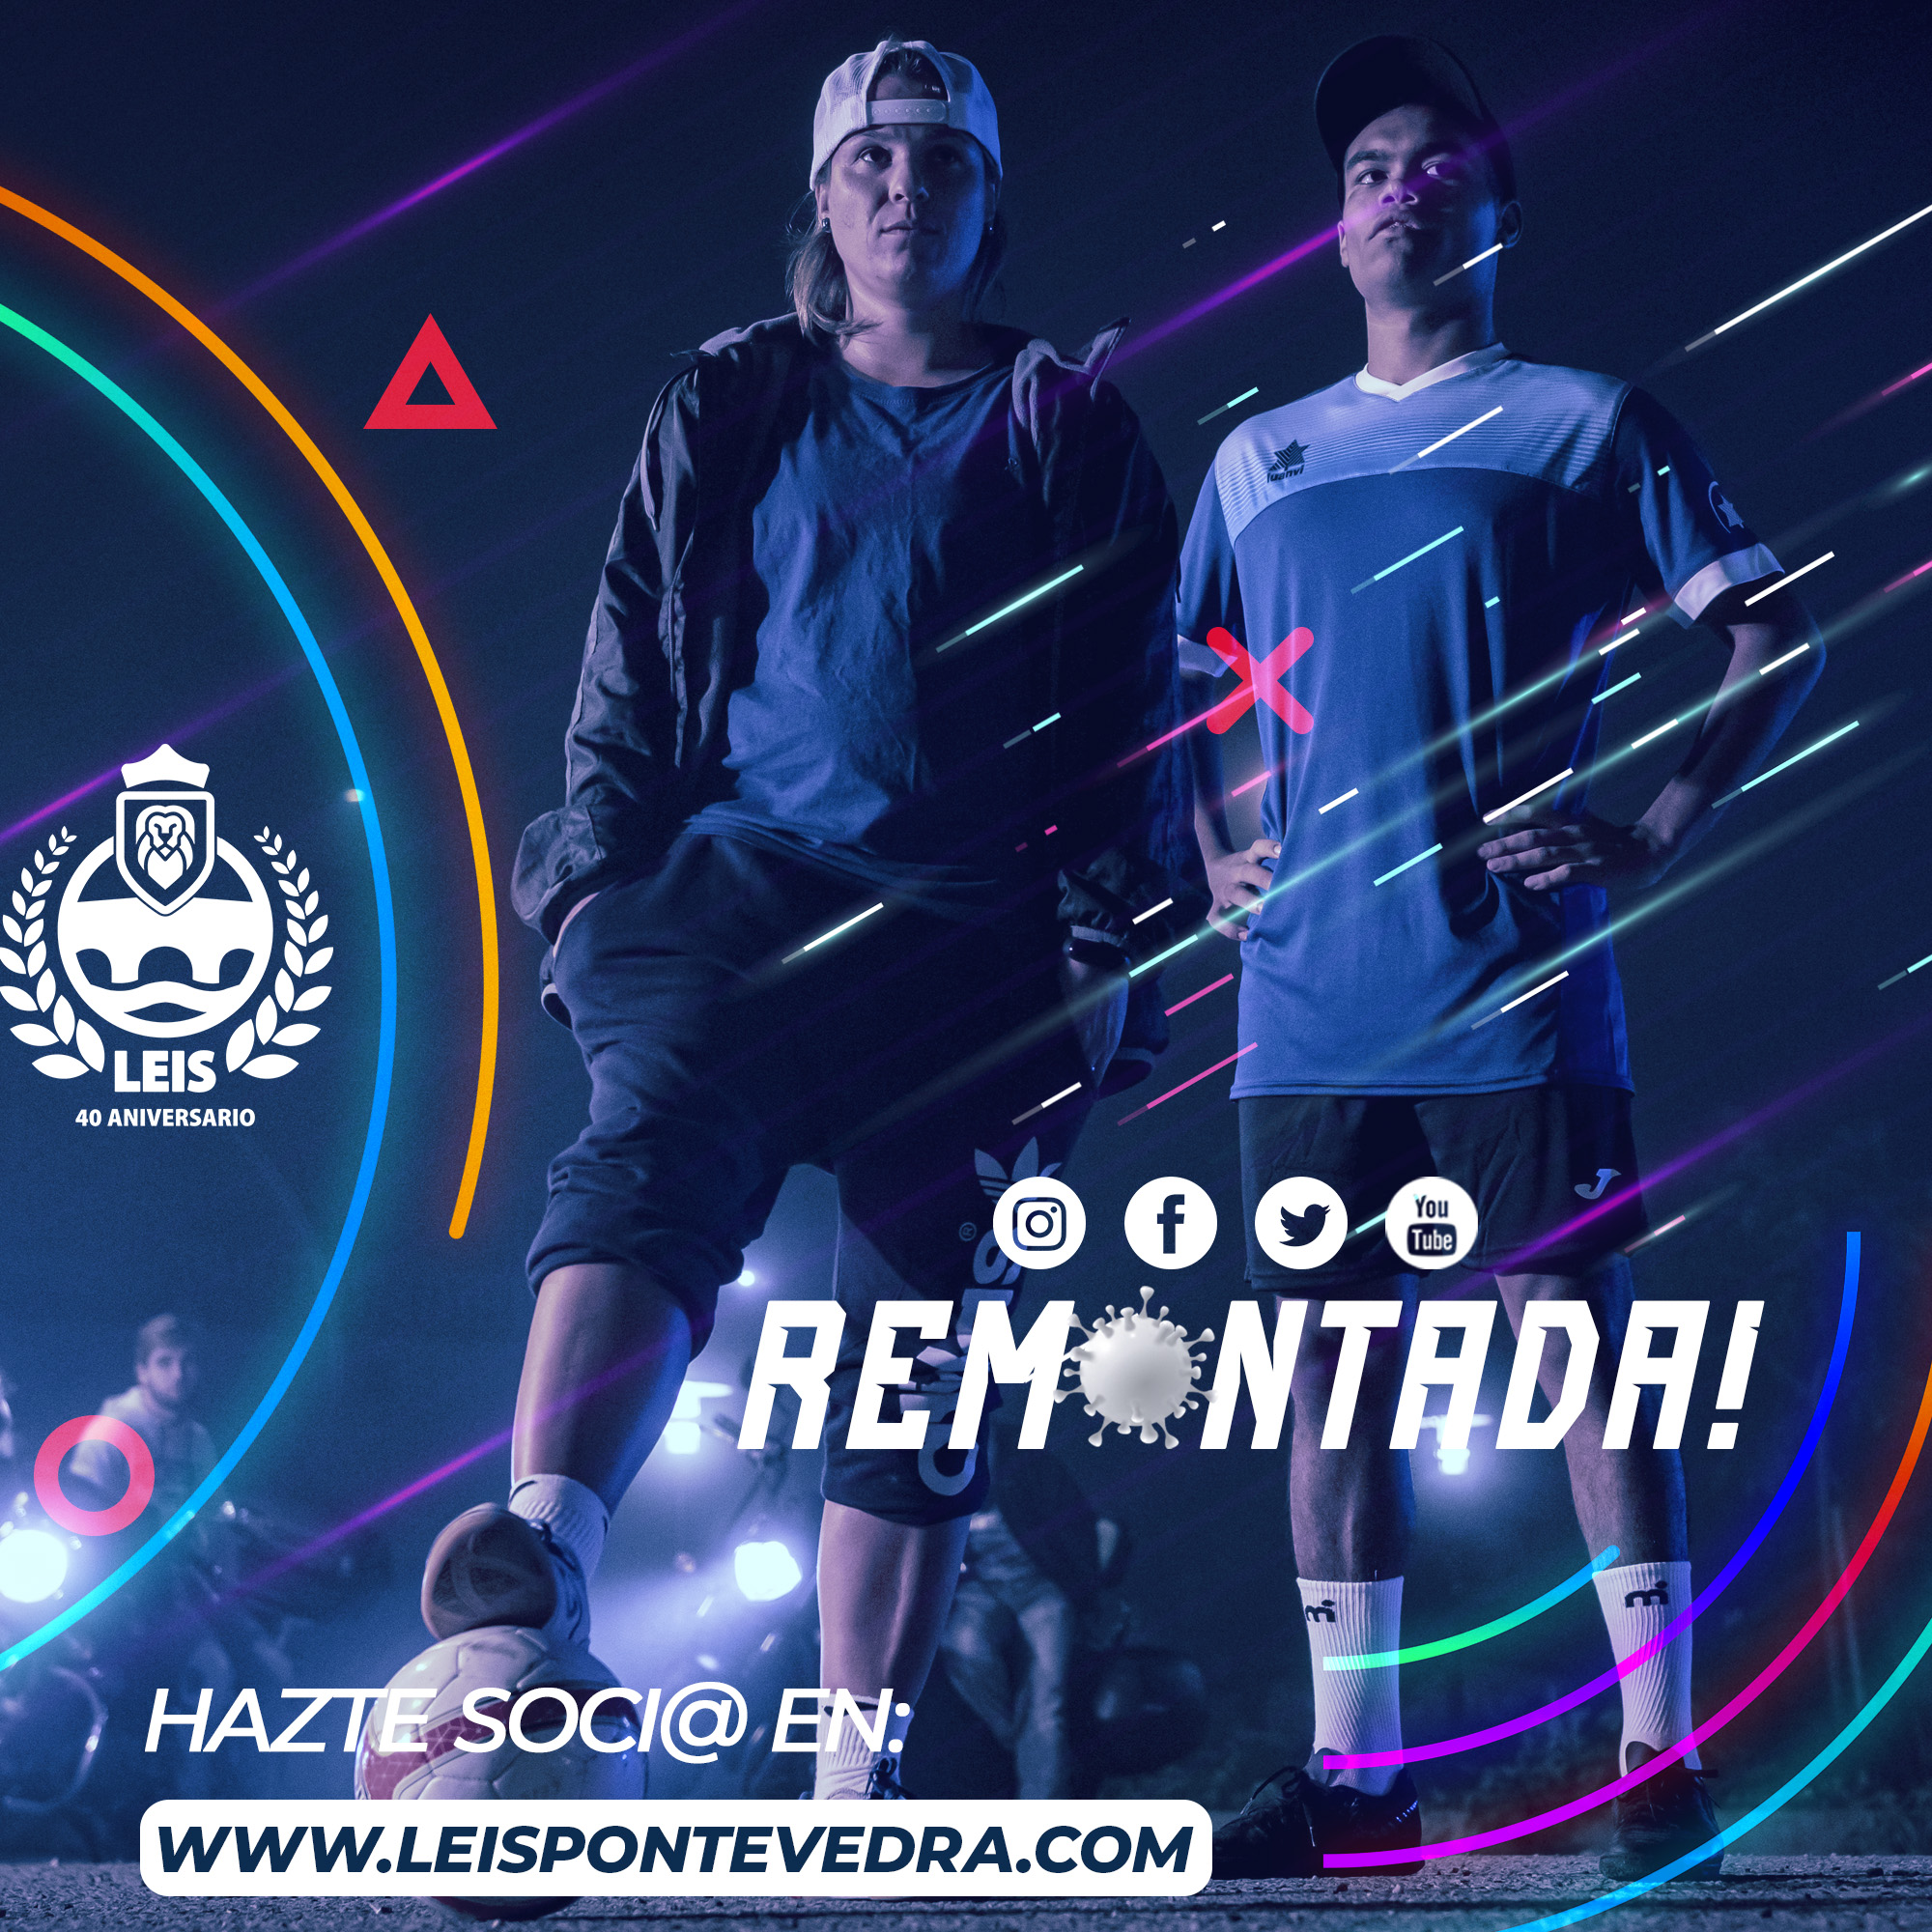 #Remontada! Socios